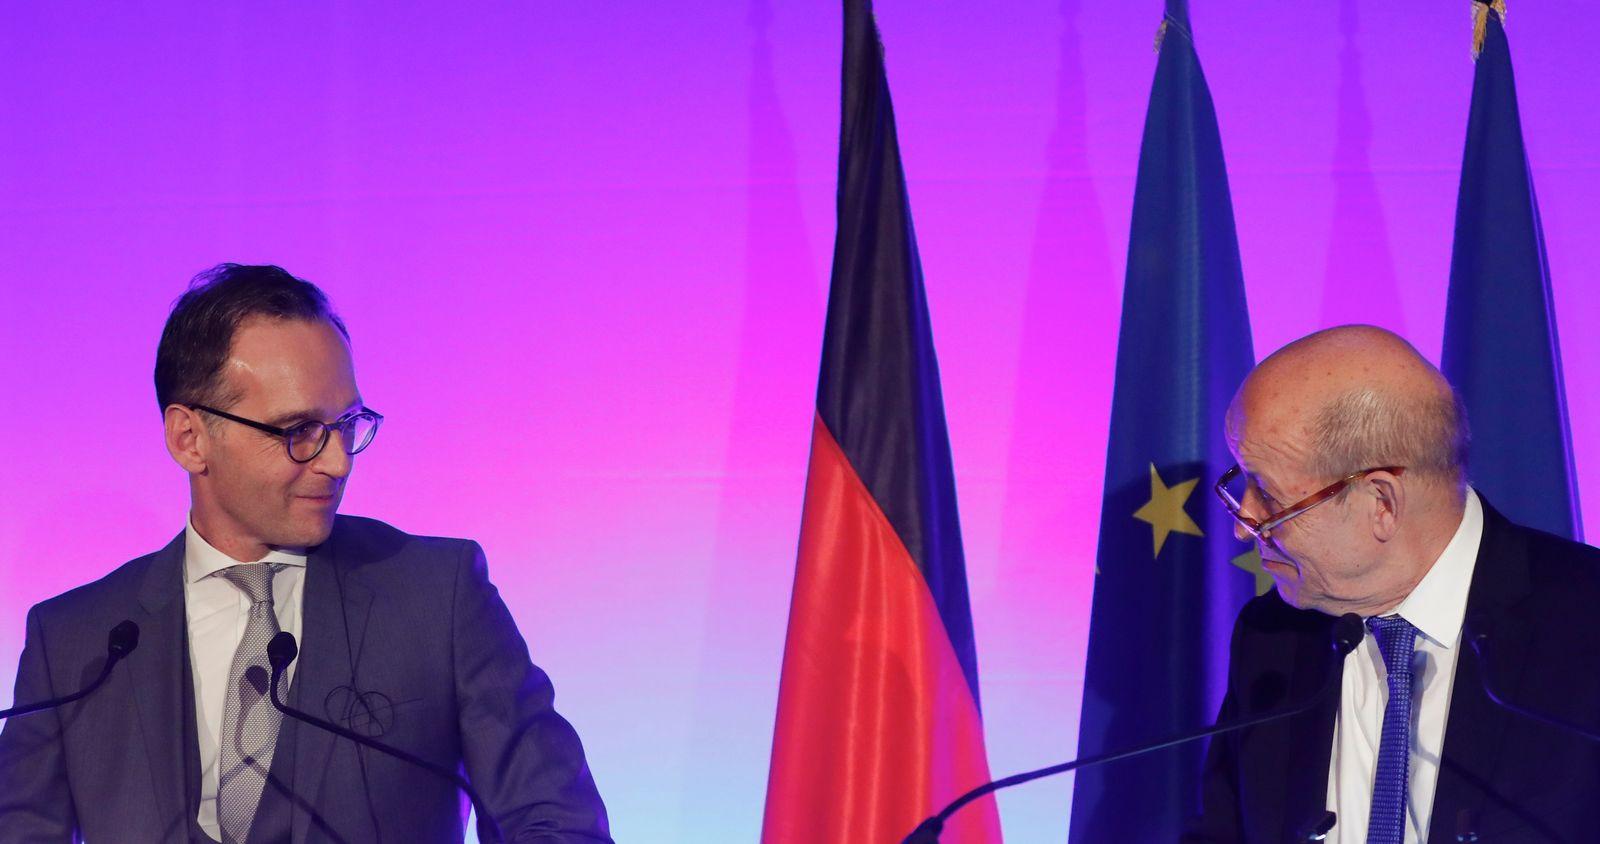 FRANCE-GERMANY-POLITICS